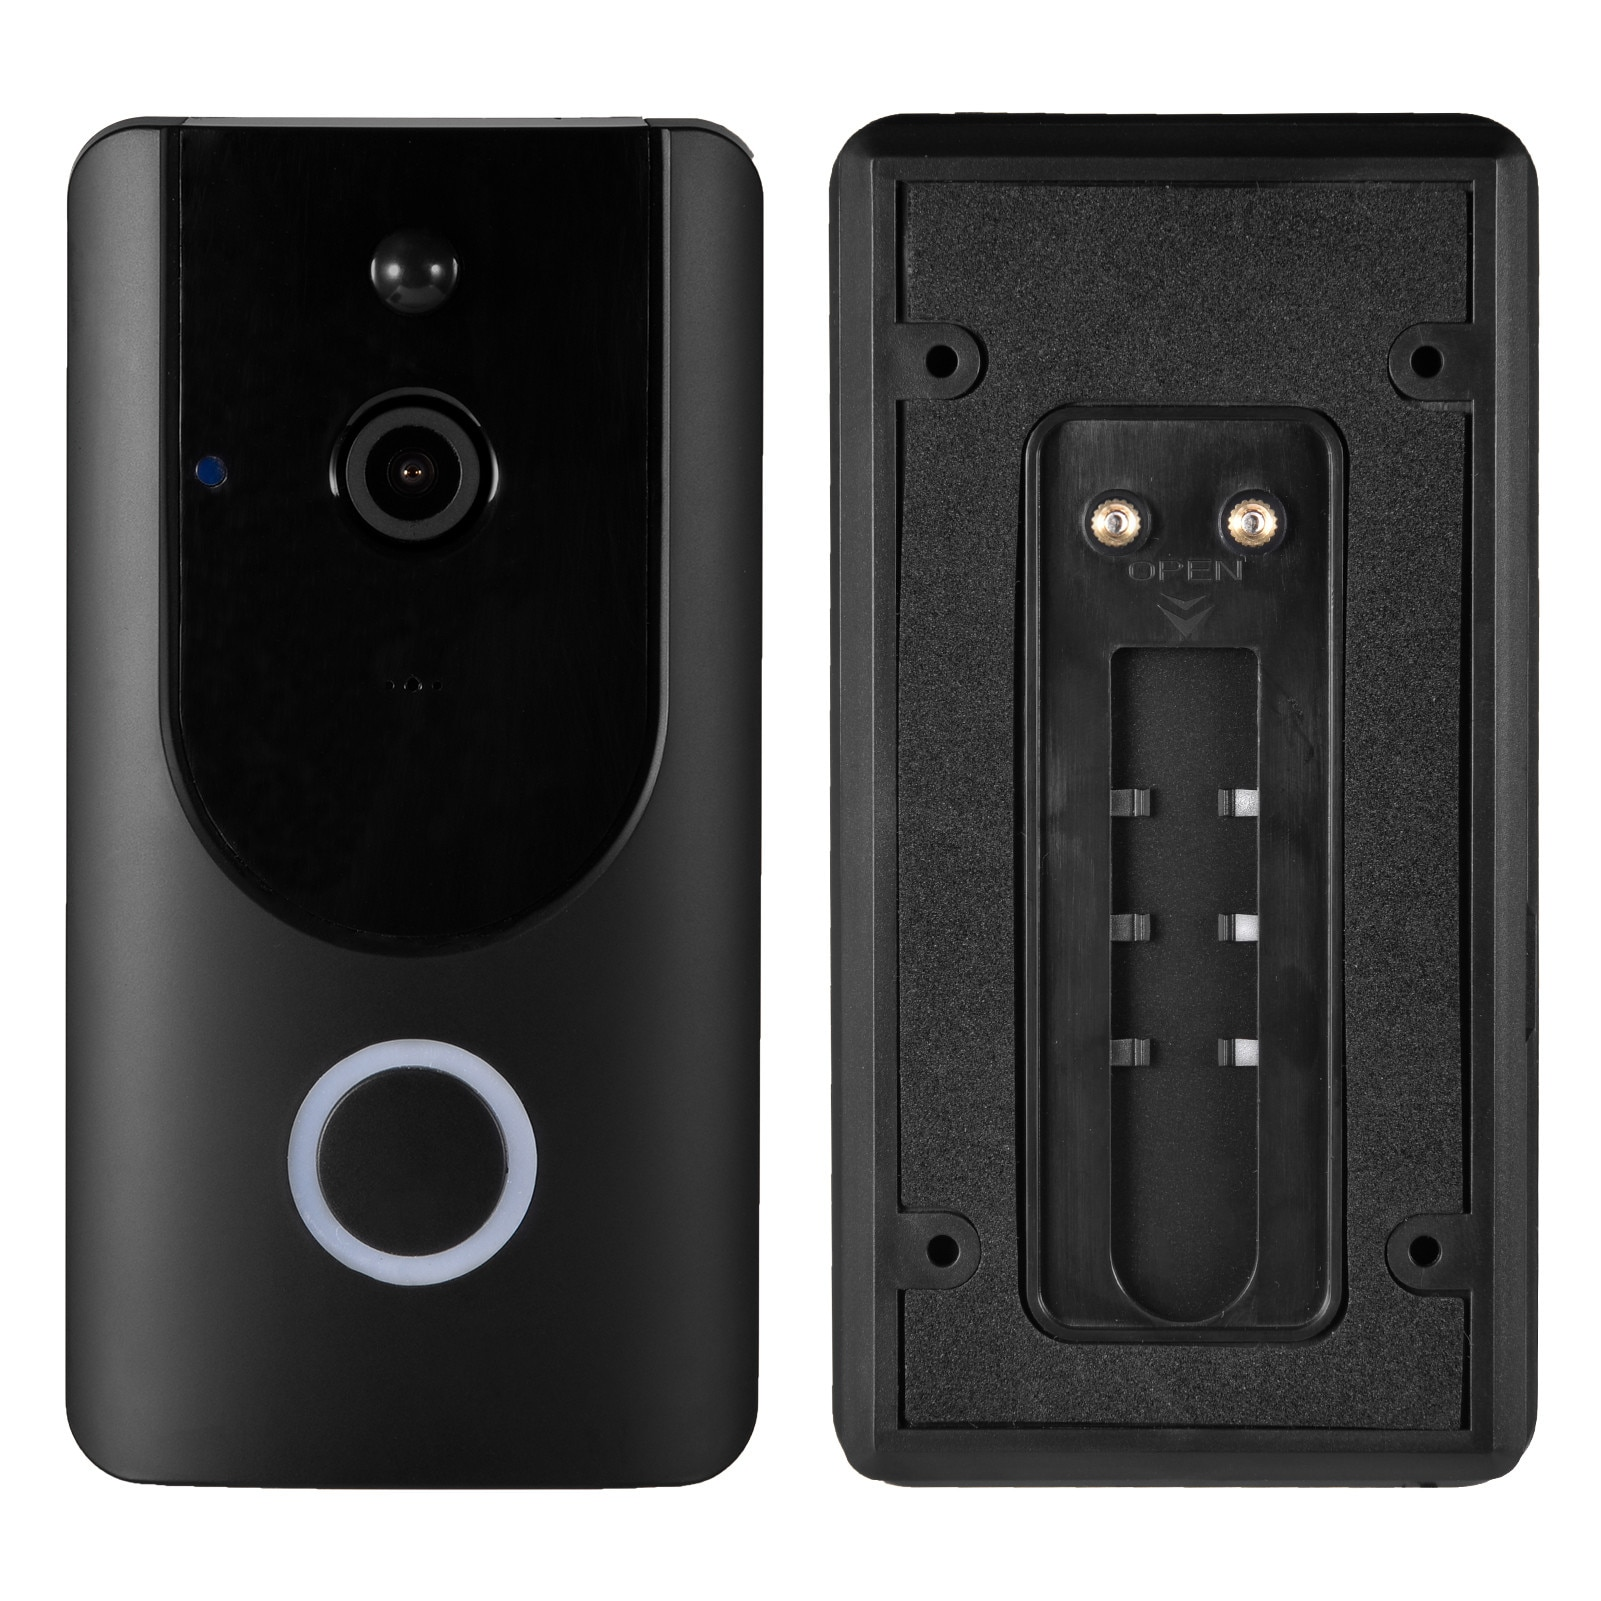 2021 HD Video Intercom Home Doorbell Smart Wireless Door Monitoring System Security Alarm Type Device 1080P APP Remote Recording